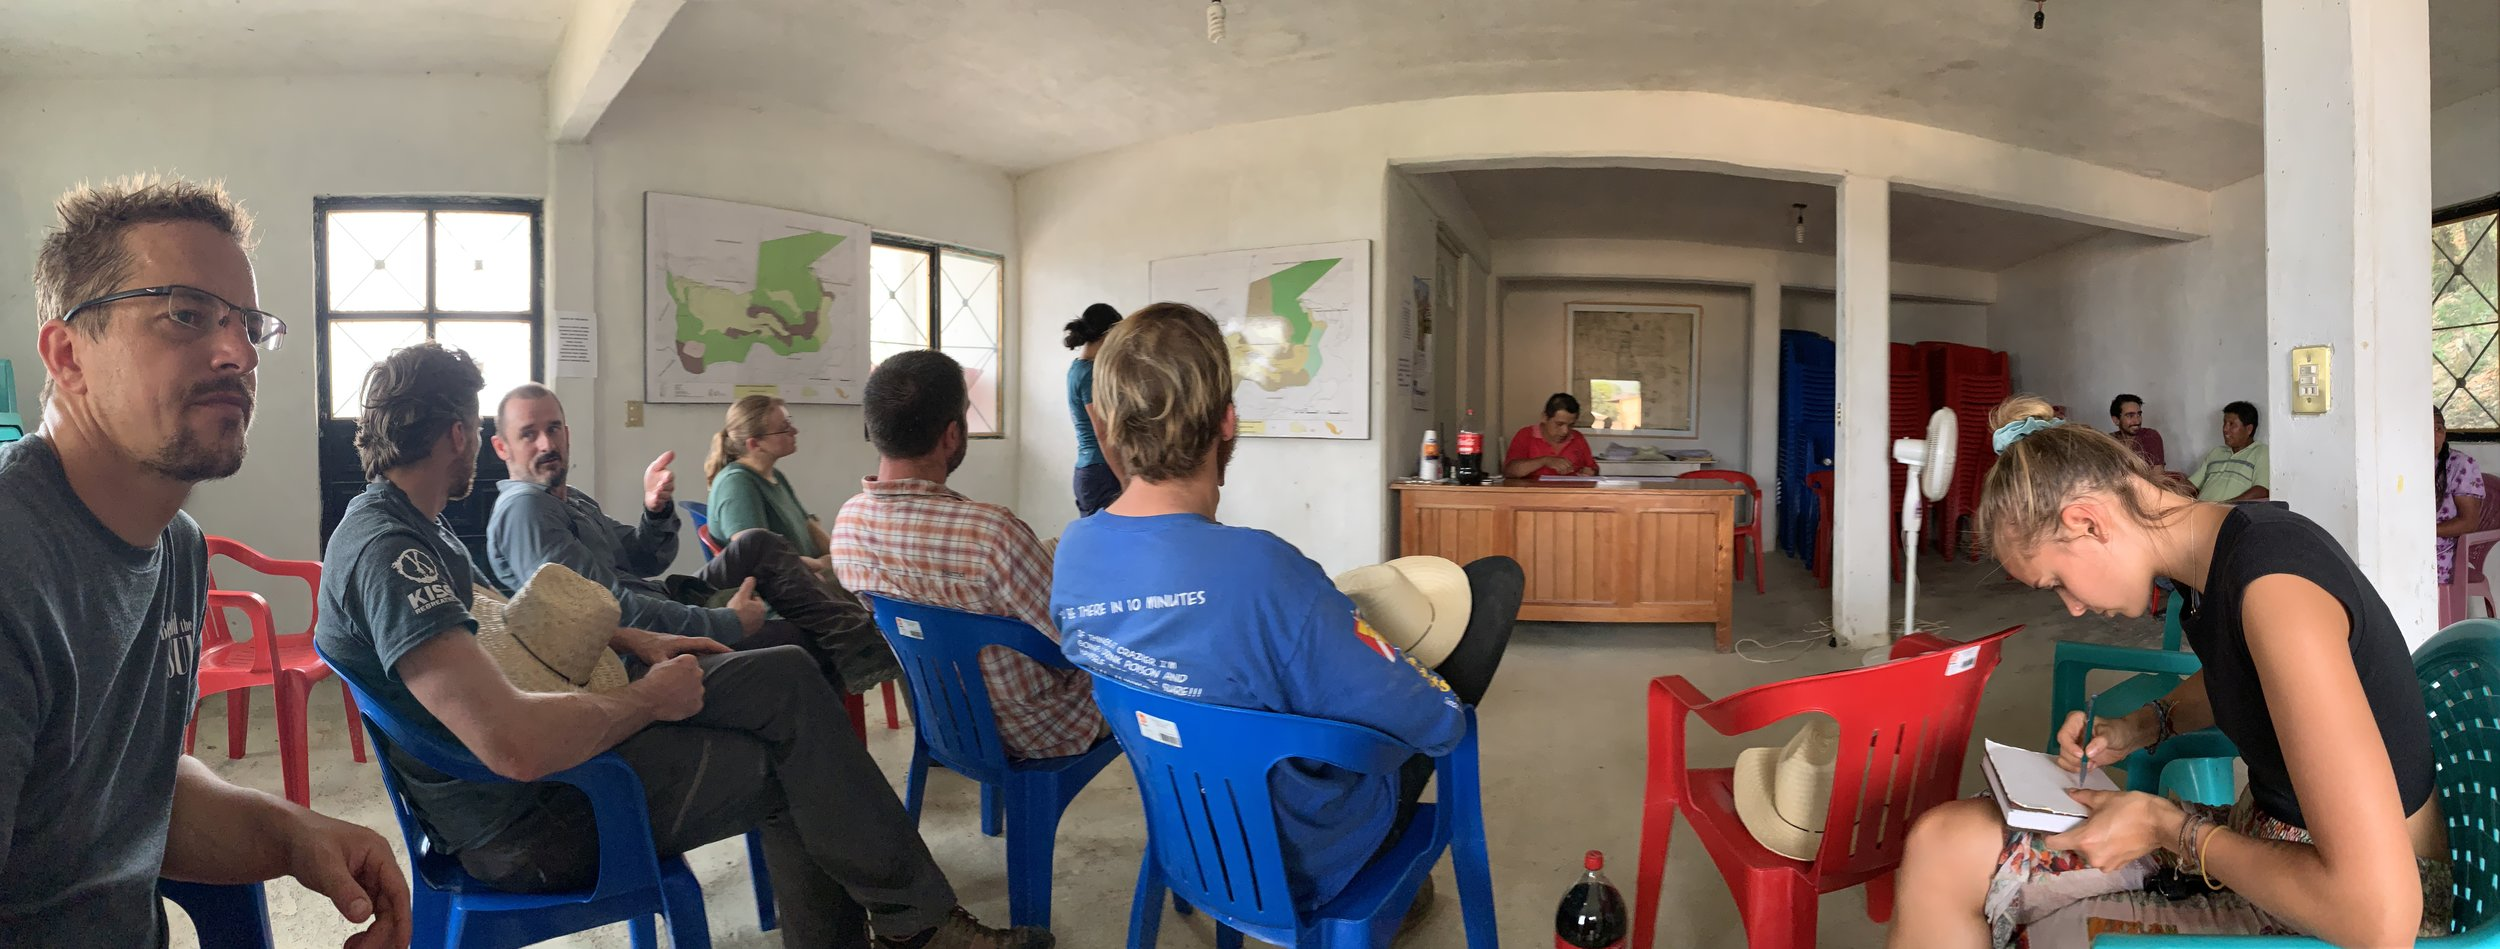 The team at a meeting in San Bartolomé Ayautla. Photo by Teddy Garlock.